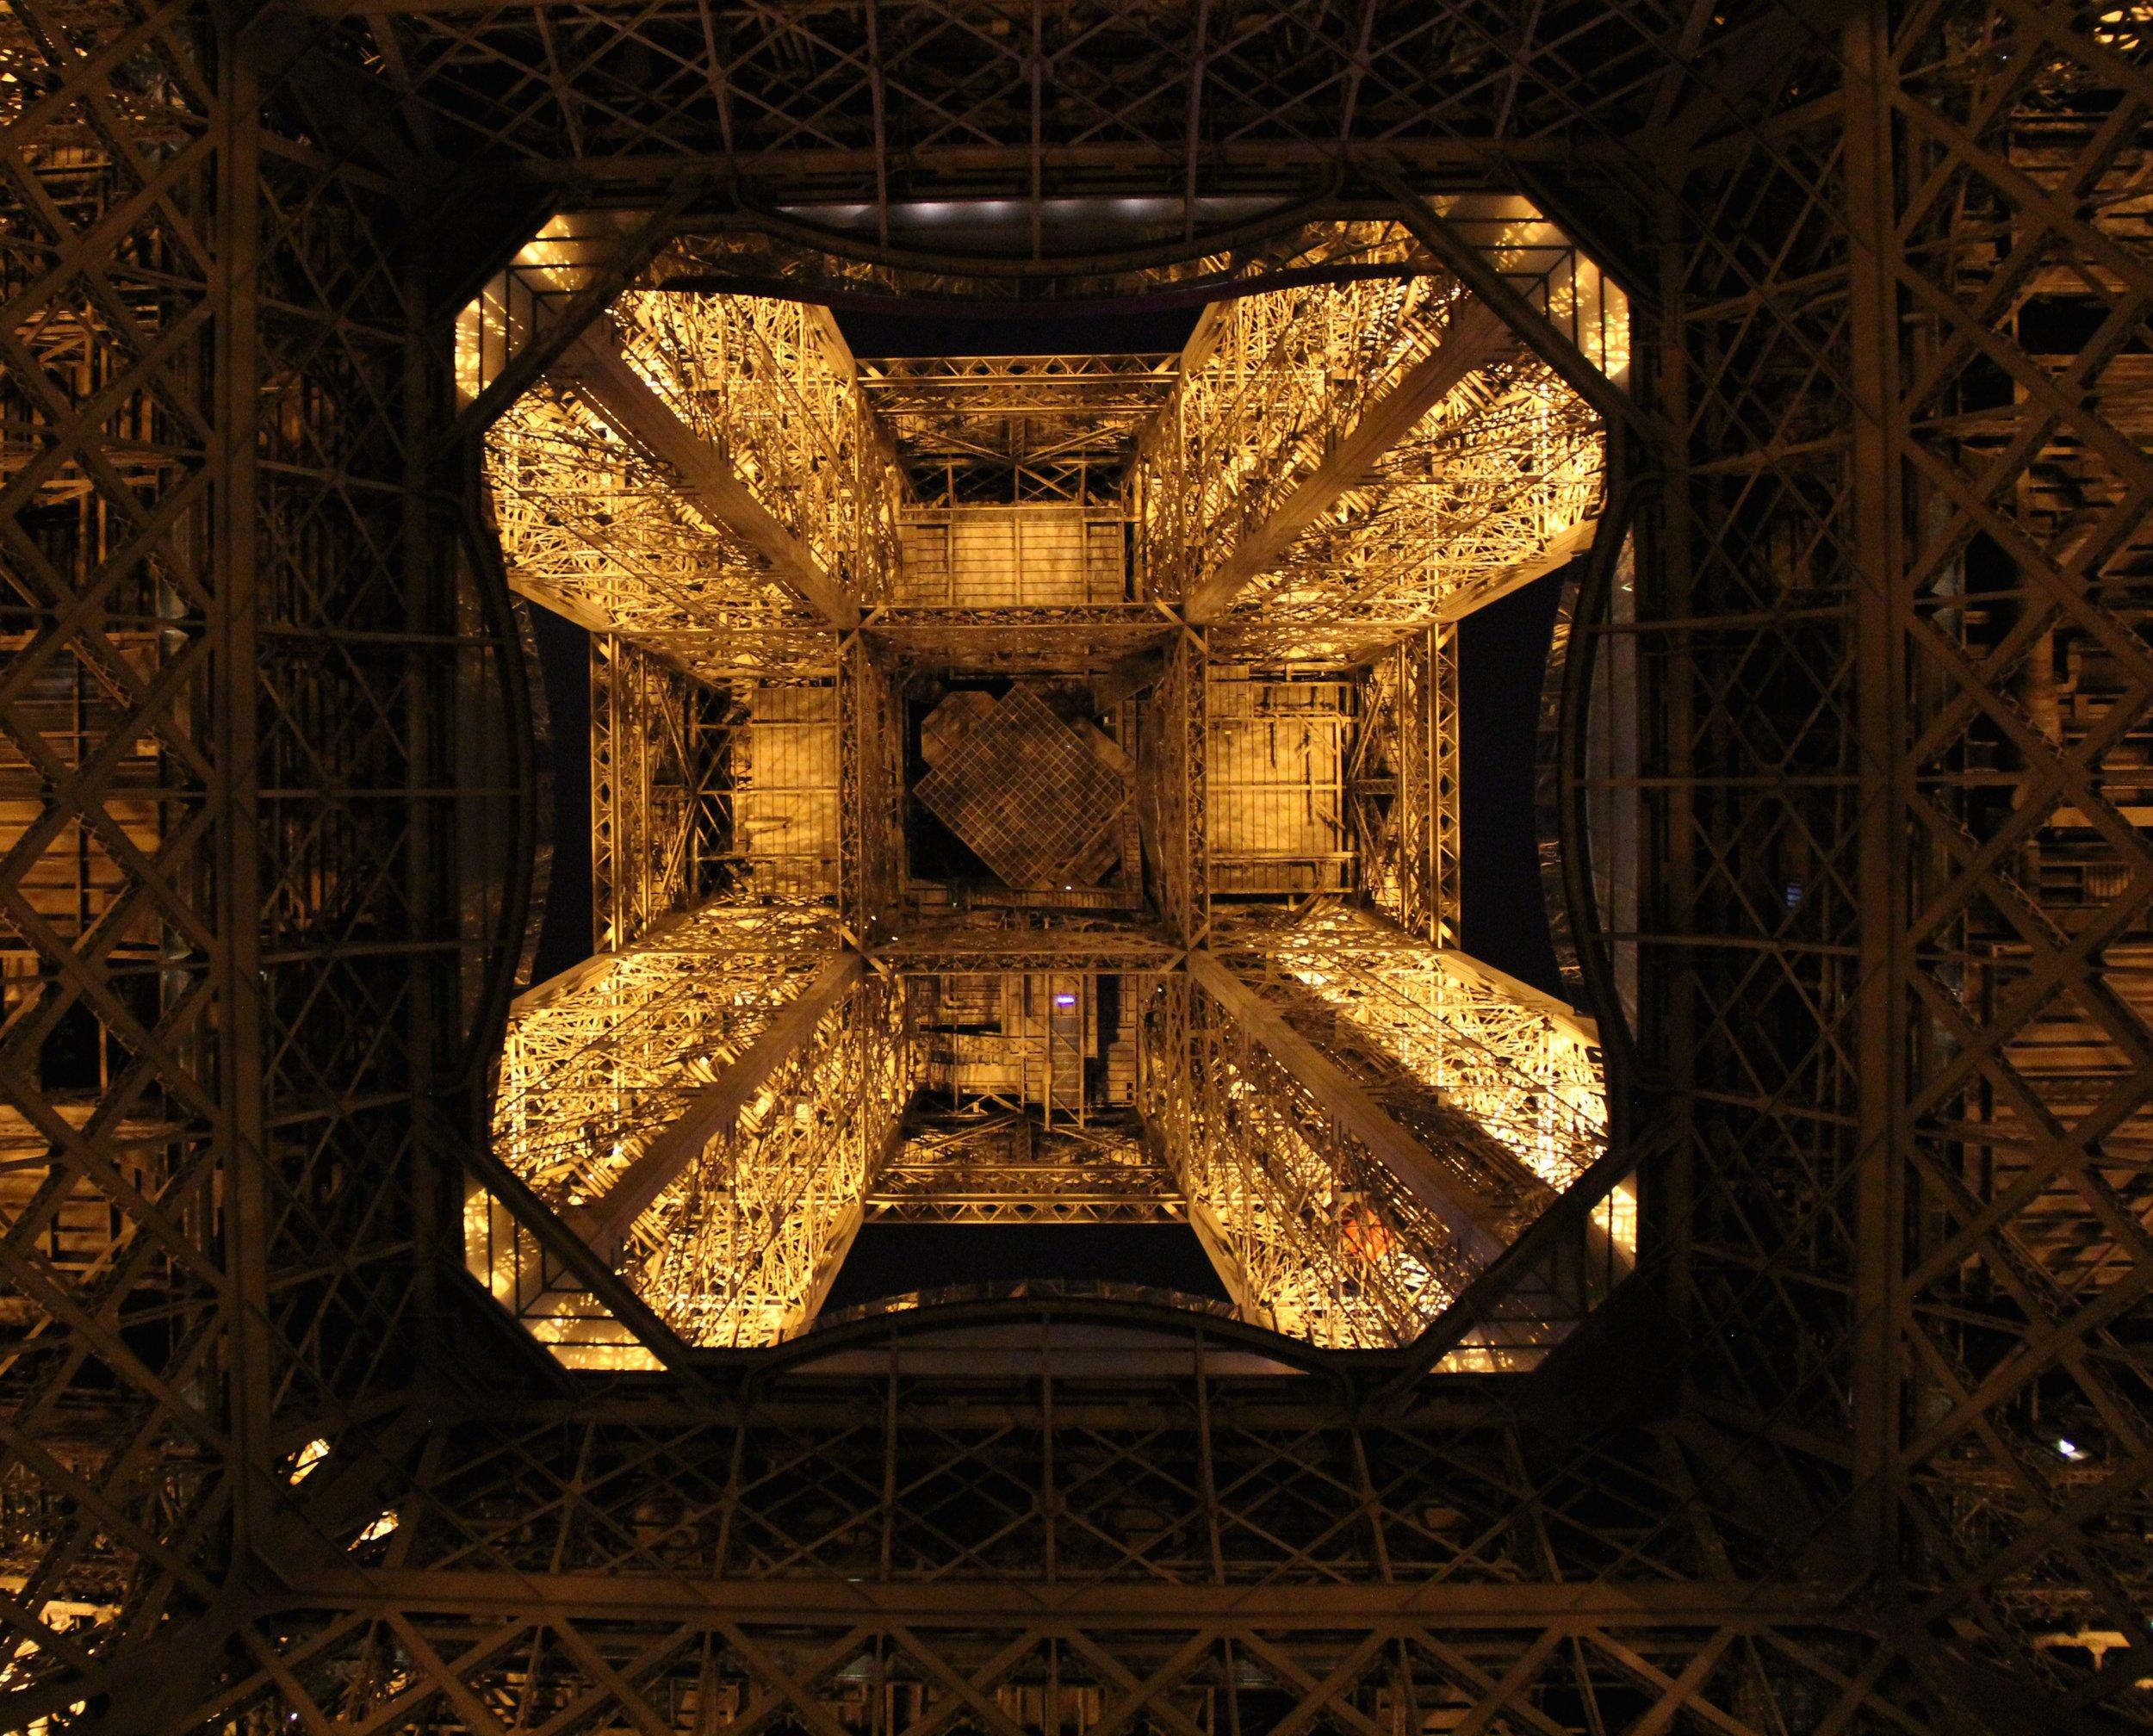 2016.09 Paris Edited 8327.jpg